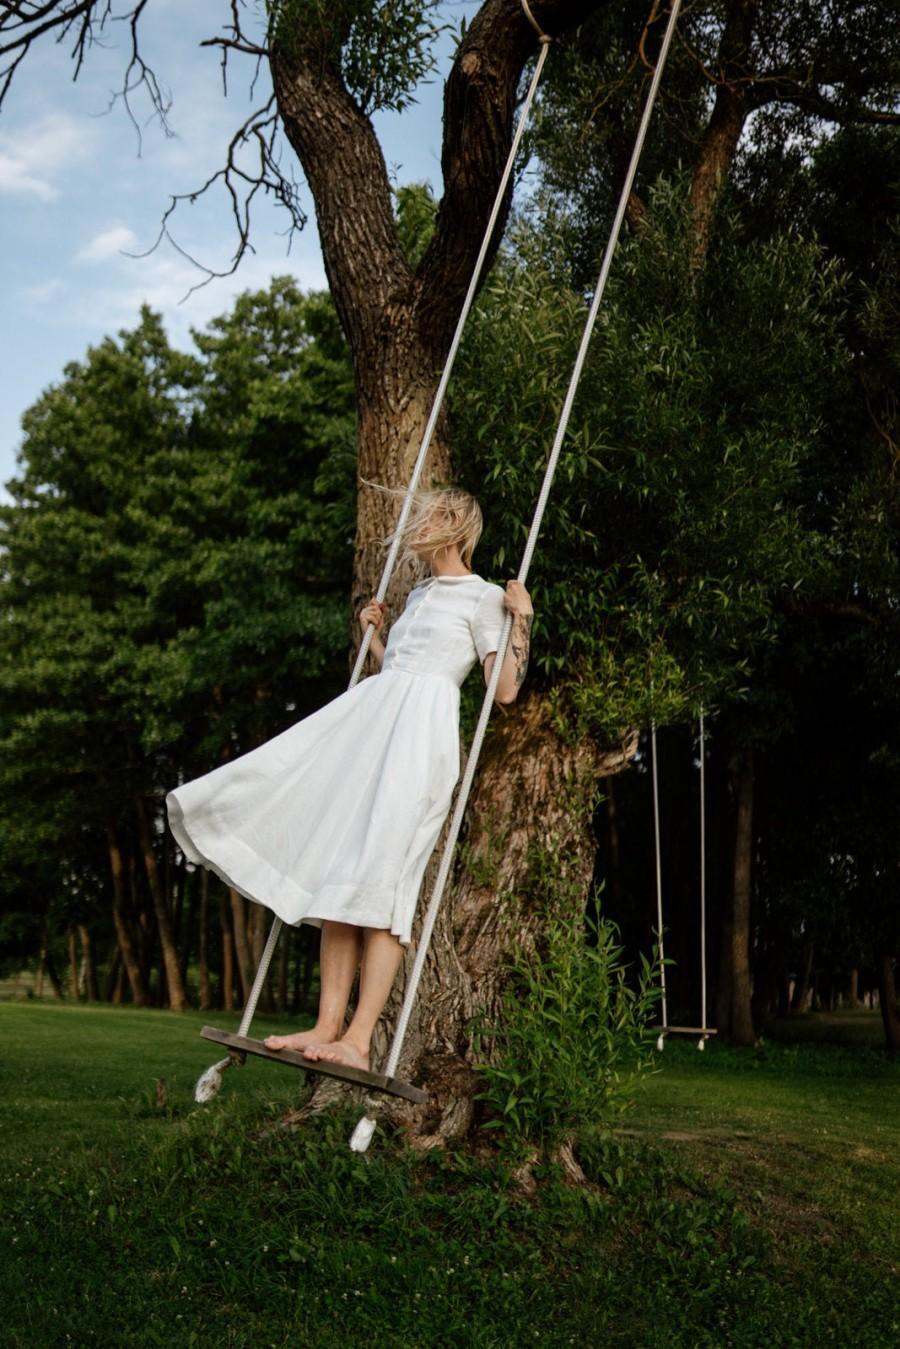 Mariage - White Linen Dress For Women, Linen Clothing, Peter Pan Collar Dress, Woodland Clothing, Simple Linen Dress, Holiday Dress  / Classic SS